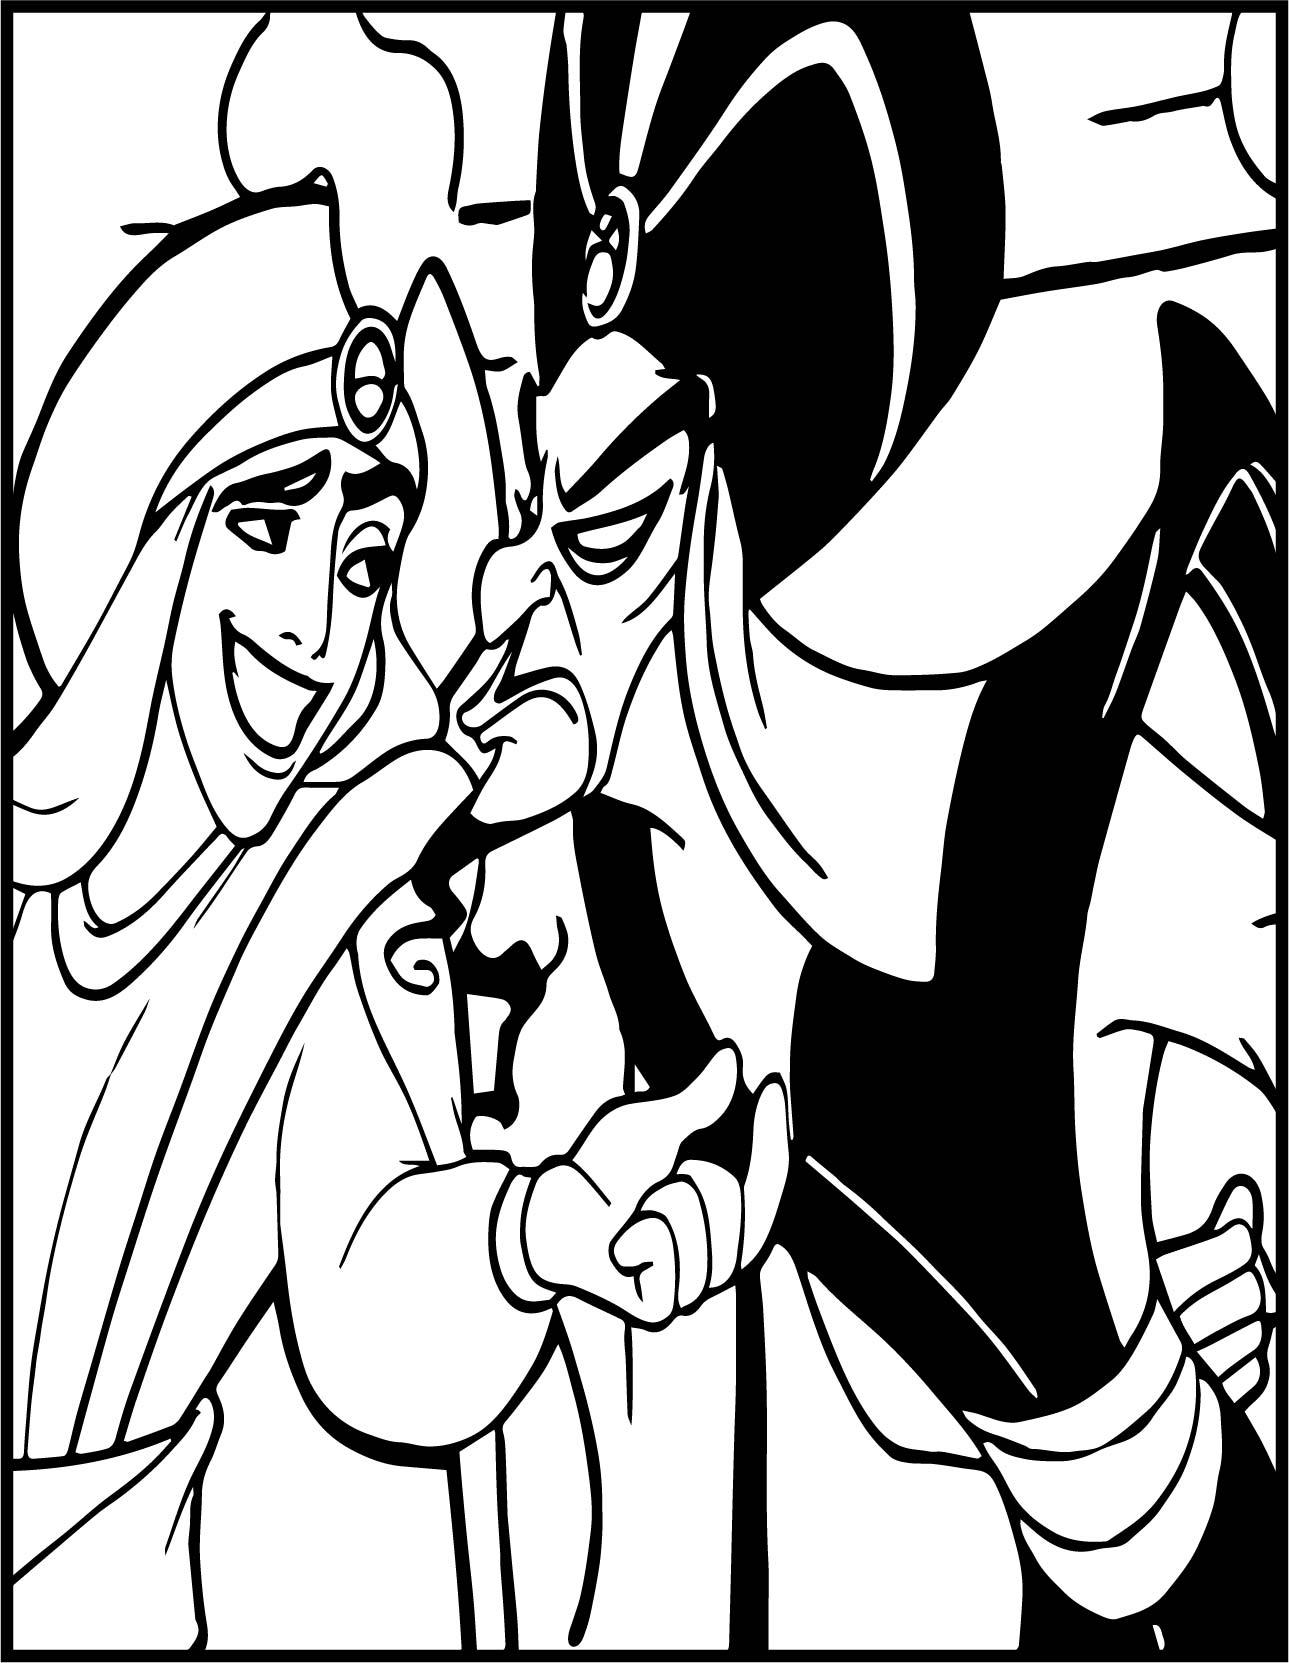 Walt Disney Prince Aladdin Walt Disney Characters Angry Coloring Page